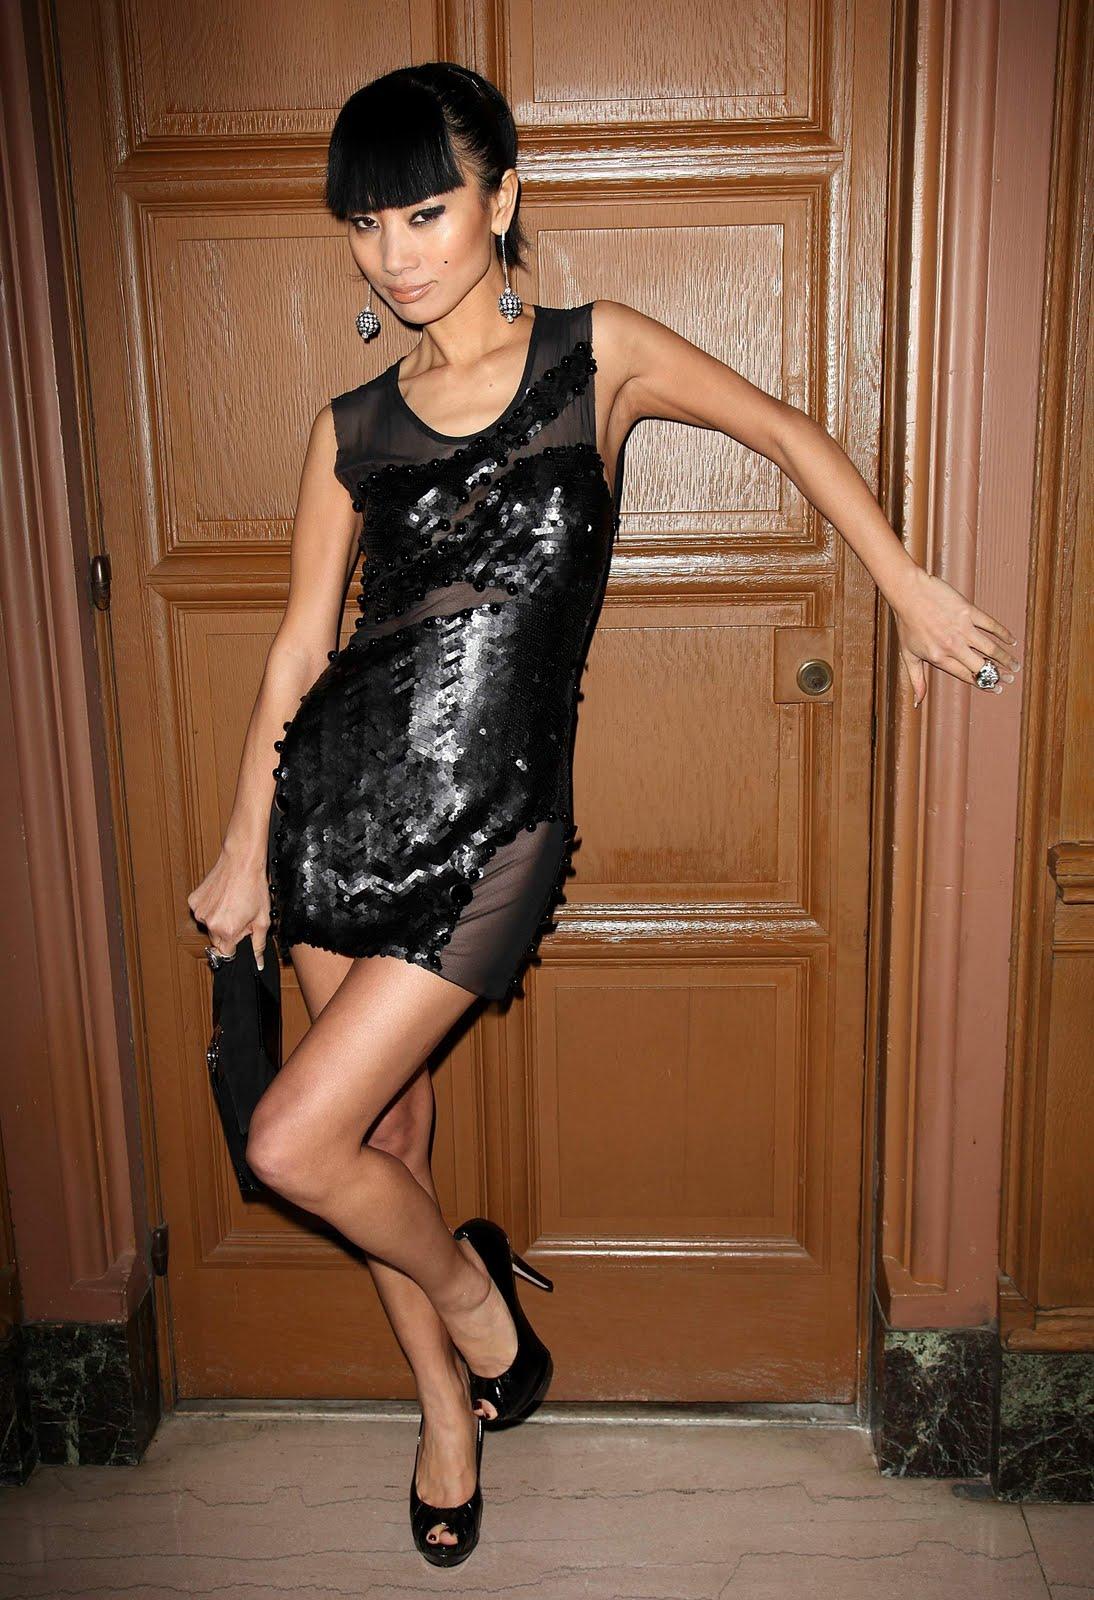 http://4.bp.blogspot.com/-_FWkwobNNsI/TWTpWNux5vI/AAAAAAAAF4w/MzeOKnCzZW0/s1600/celebskin_bai_ling_little_black_dress_seethru_backless_5.jpg